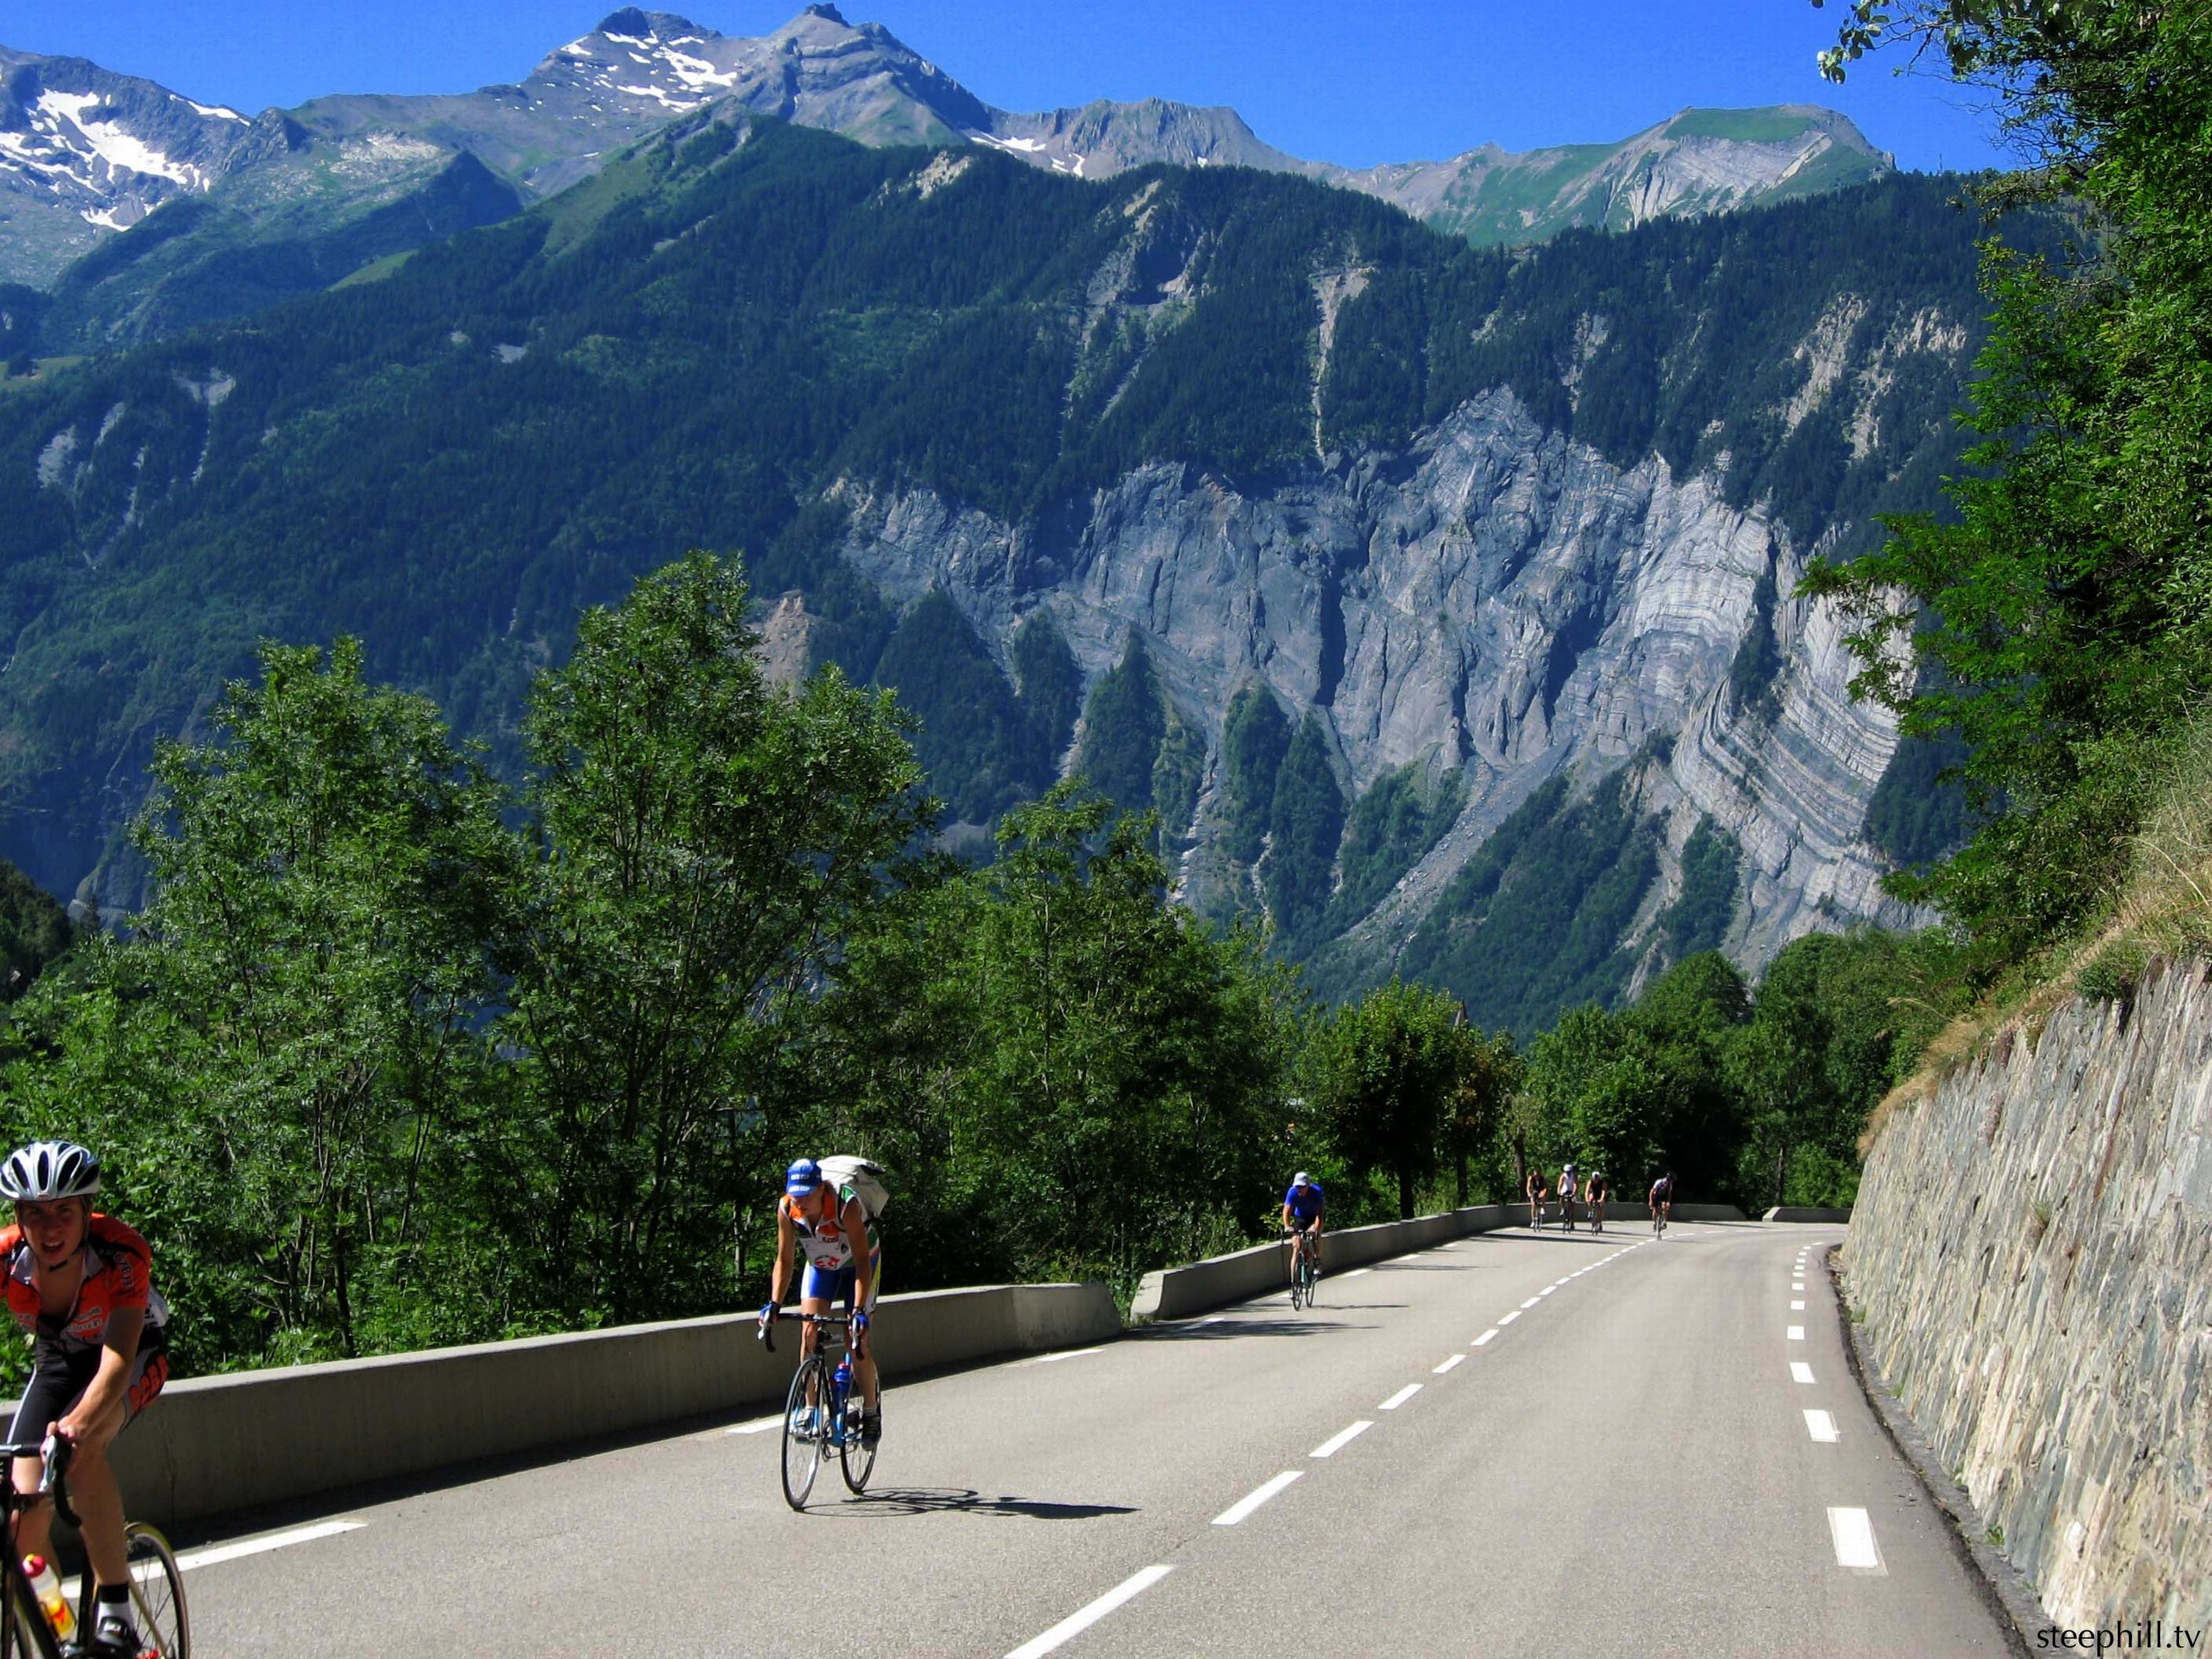 mountains sports roads cycling Tour de France alpe d 3098x2323